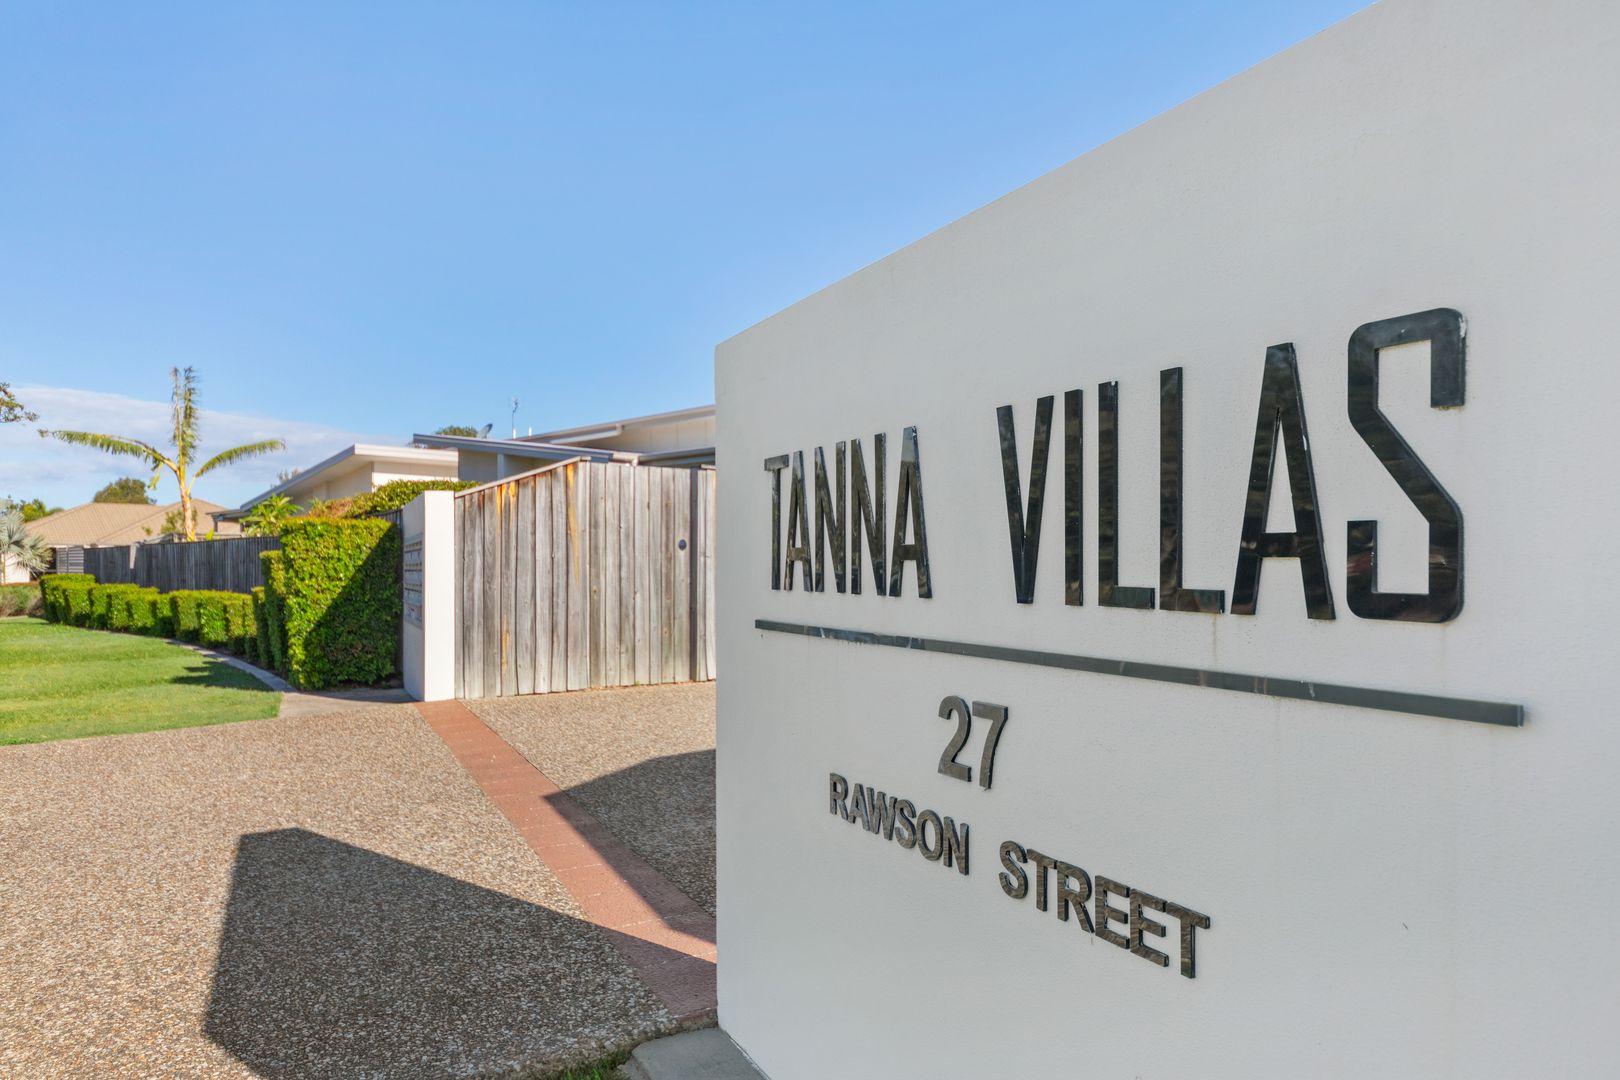 Unit 7 'Tanna Villas' 27 Rawson Street, Caloundra West QLD 4551, Image 1